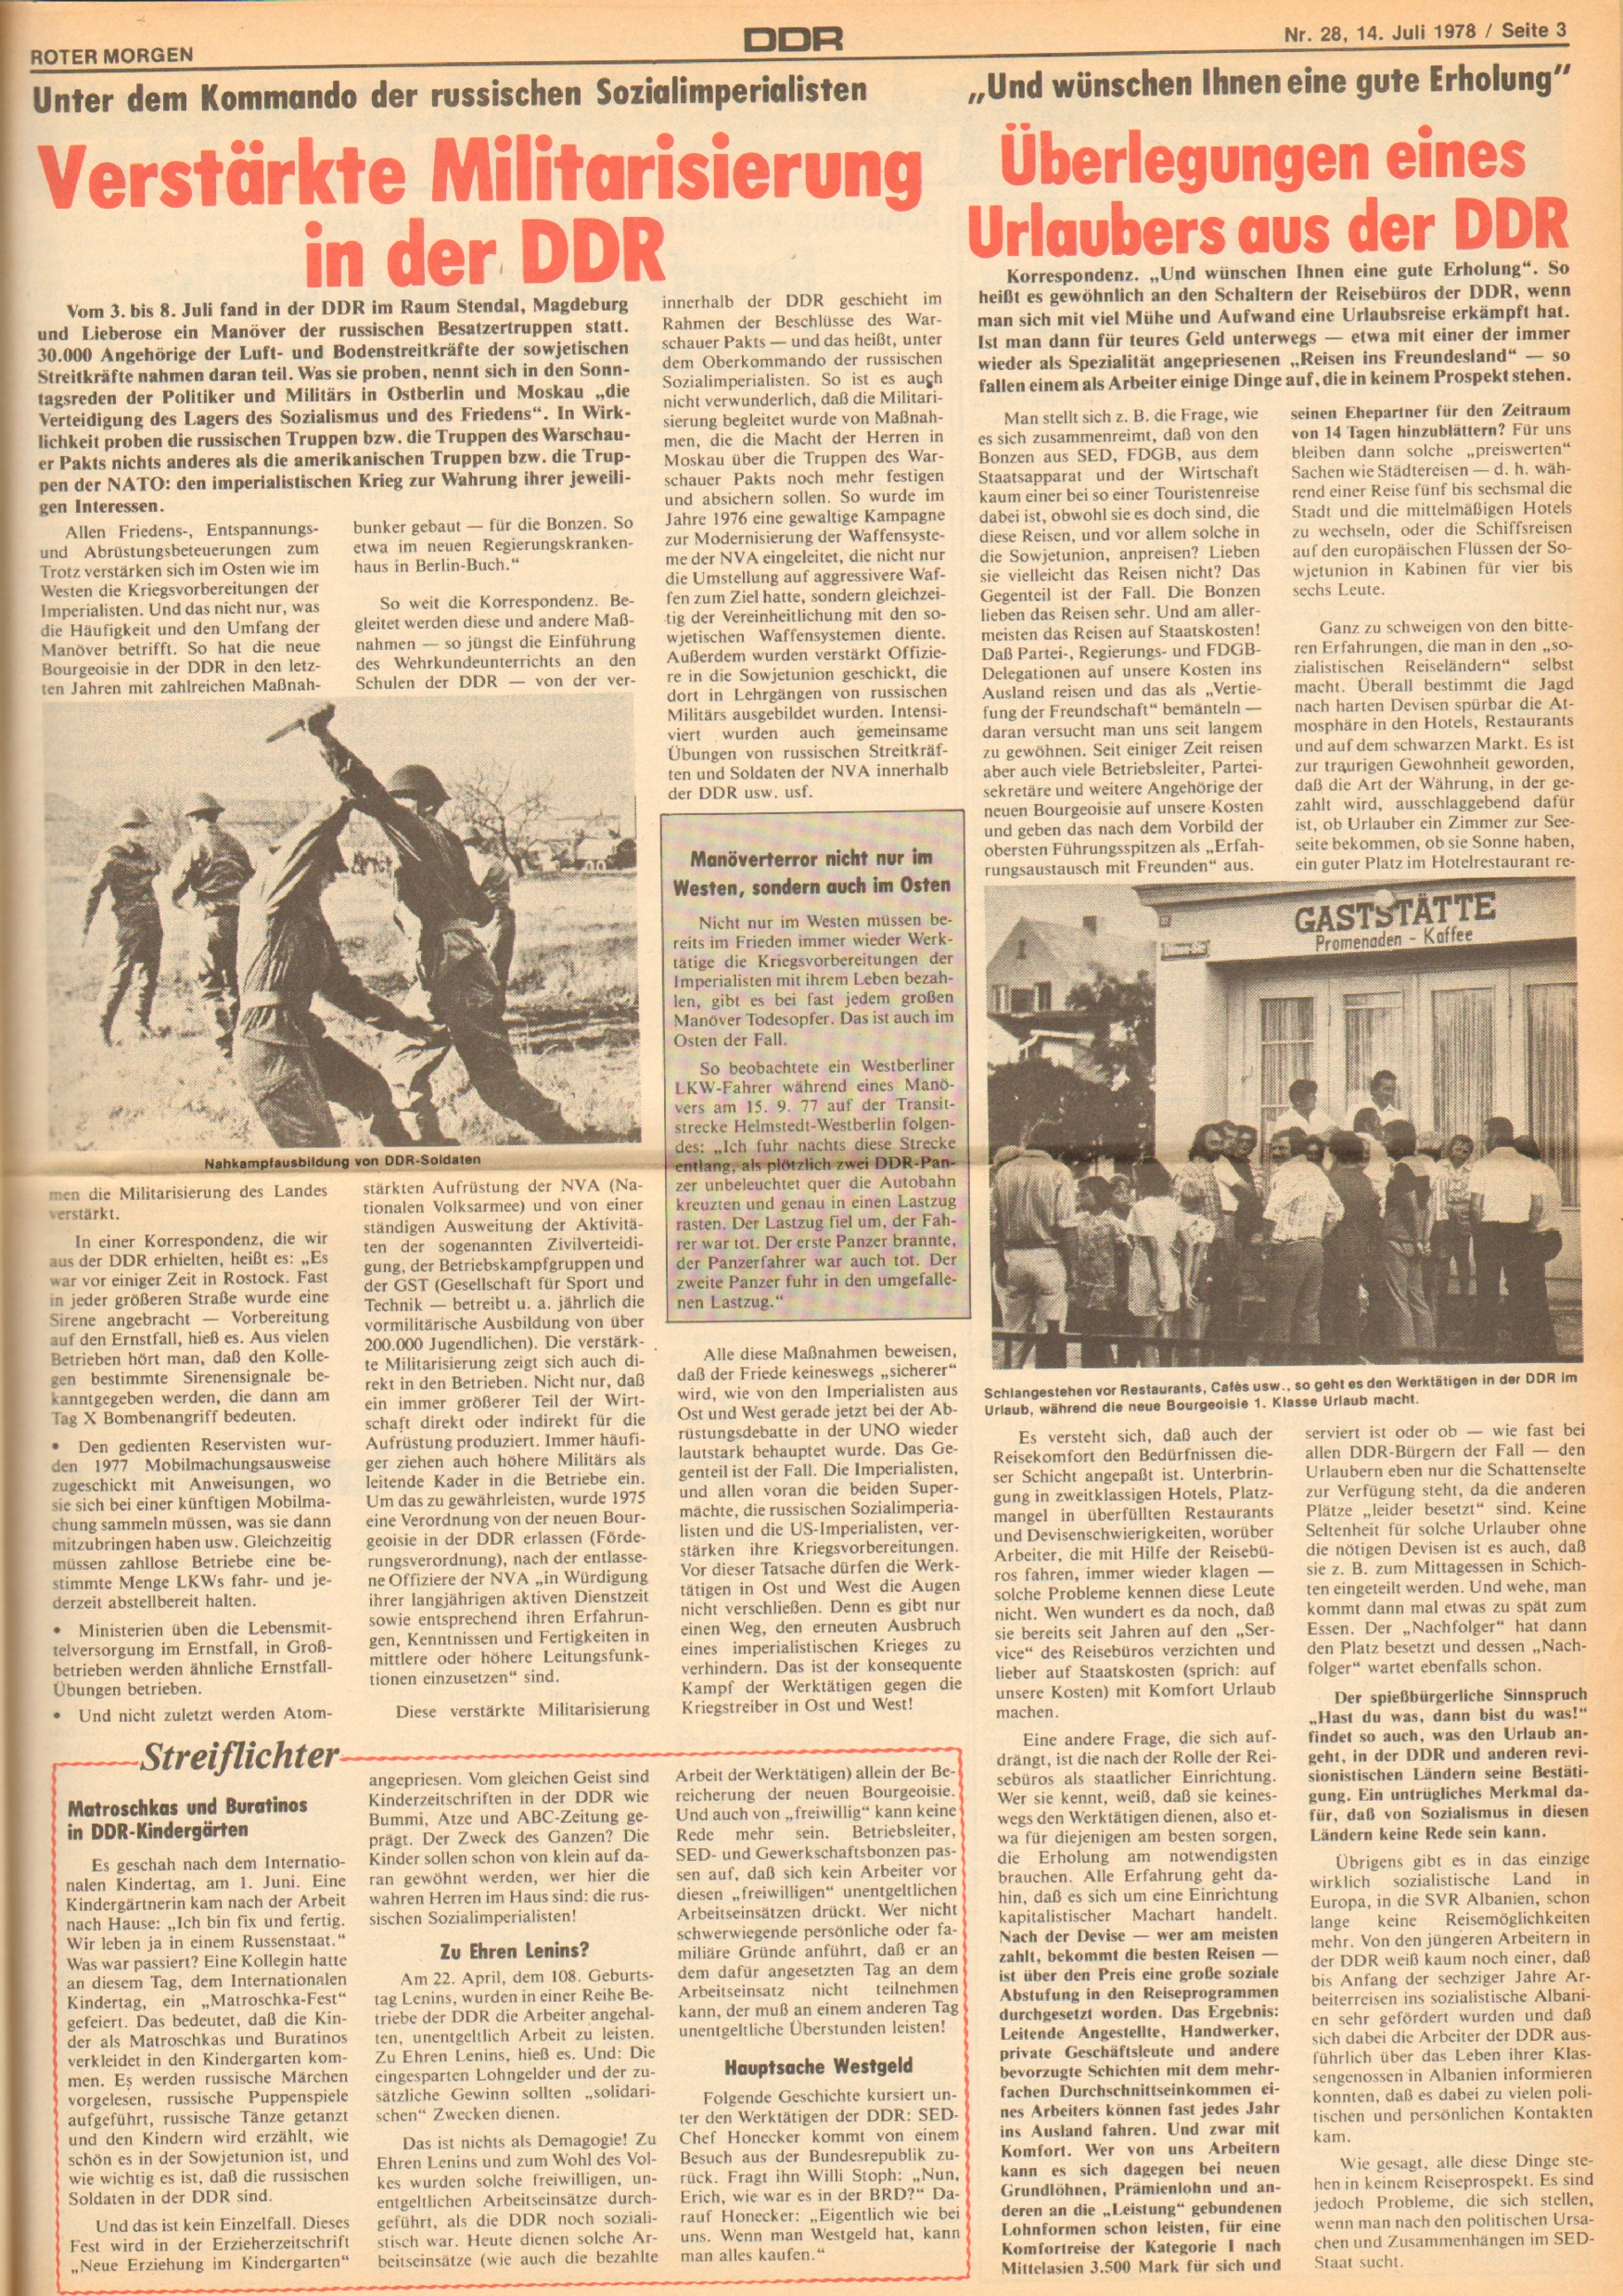 Roter Morgen, 12. Jg., 16. Juli 1978, Nr. 28, Seite 3